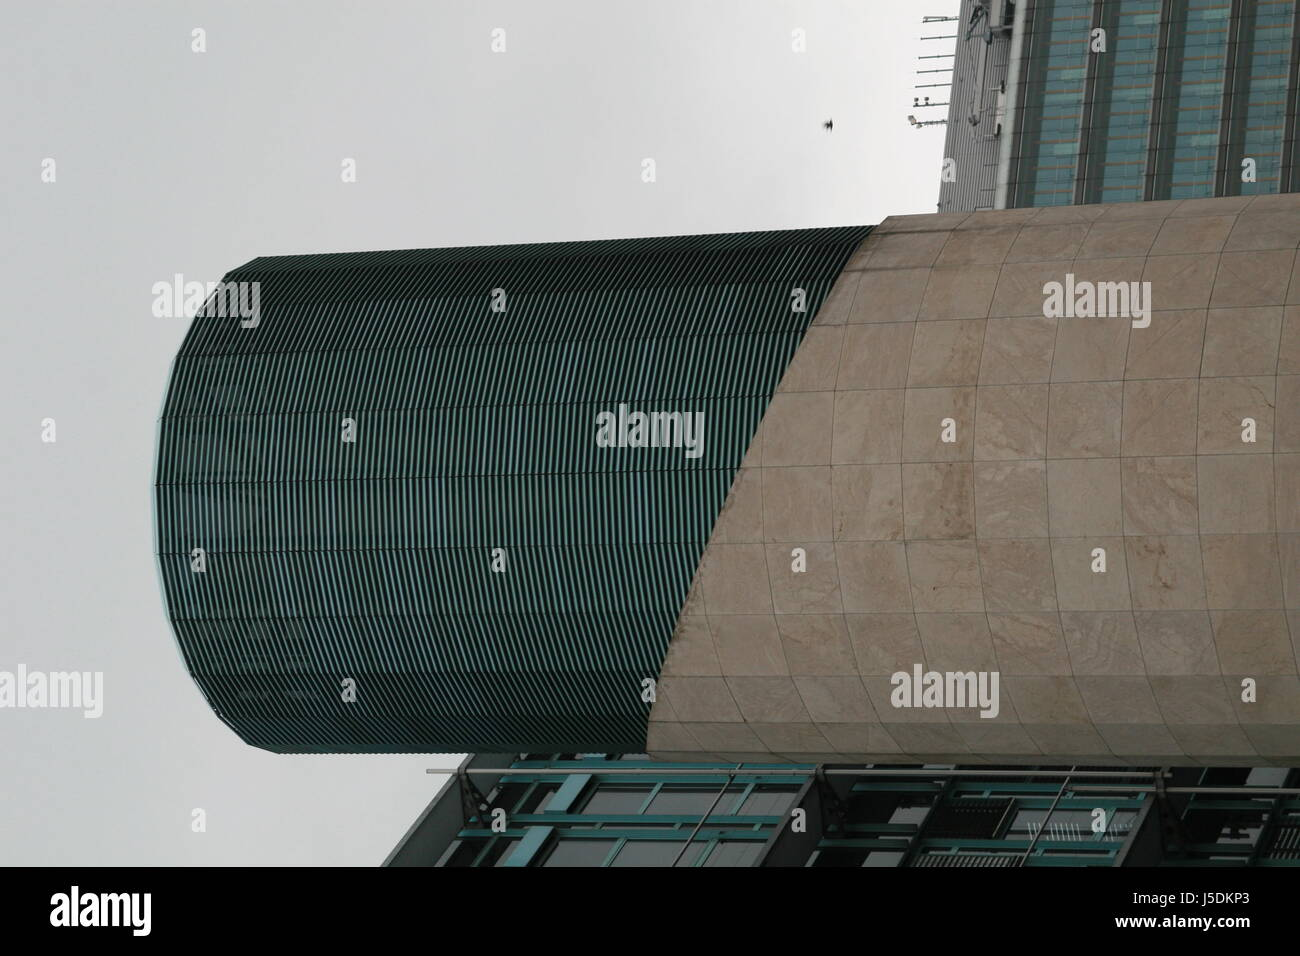 detail function airing revetment ventilation functional constructional chimney - Stock Image